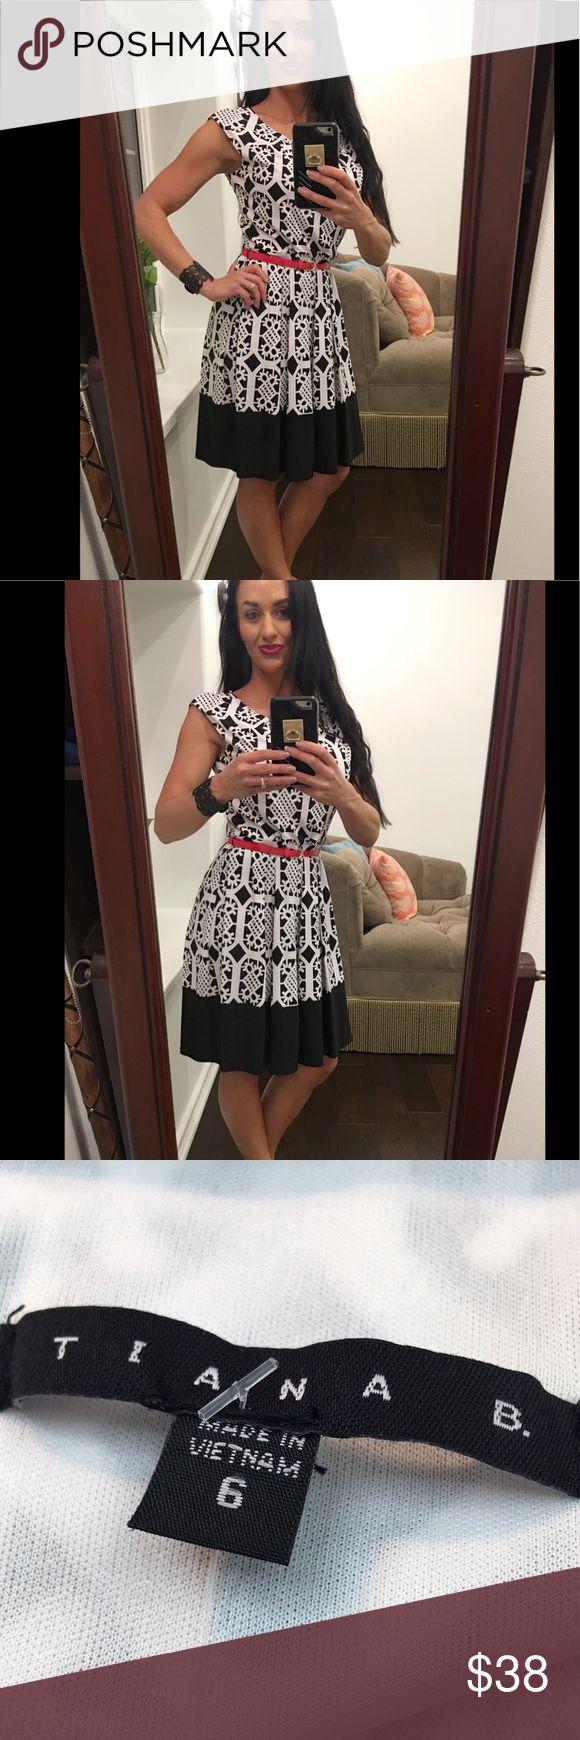 Tiana B. Black and white dress with red belt Tiana B. Black and white dress with red belt a-line size 6 19m-dresses Tiana B Dresses Midi